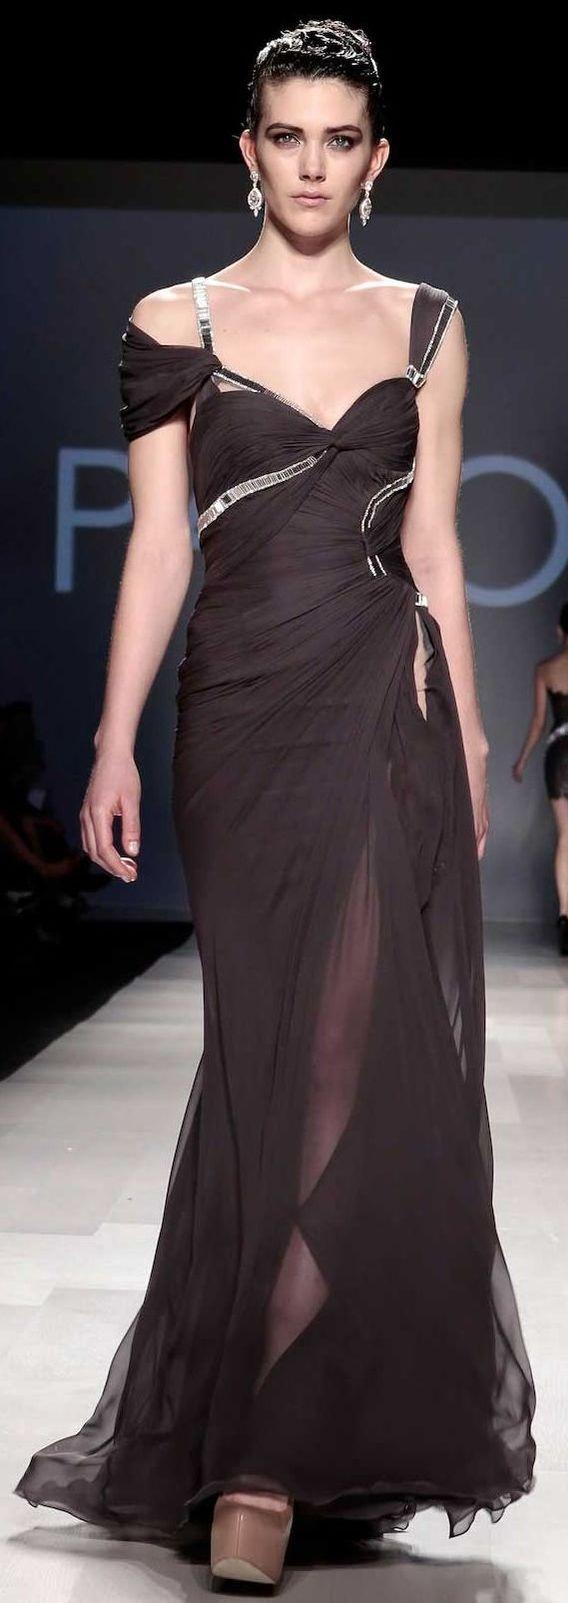 Pavoni red carpet fashion pinterest couture designer gowns